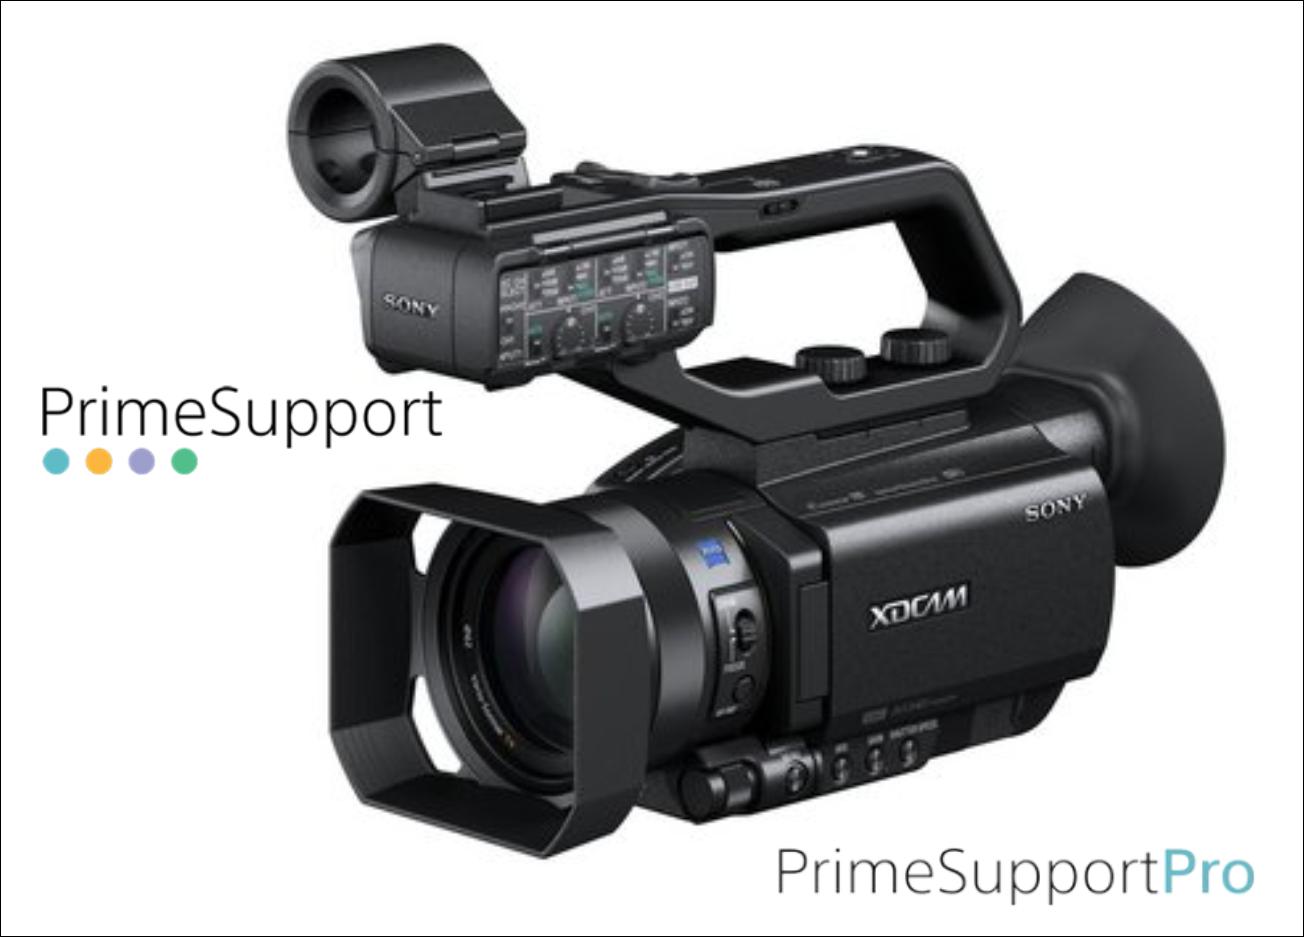 Sony PXW-X70 4K + 1 Ano de Garantia Adicional (Prime Support PRO)